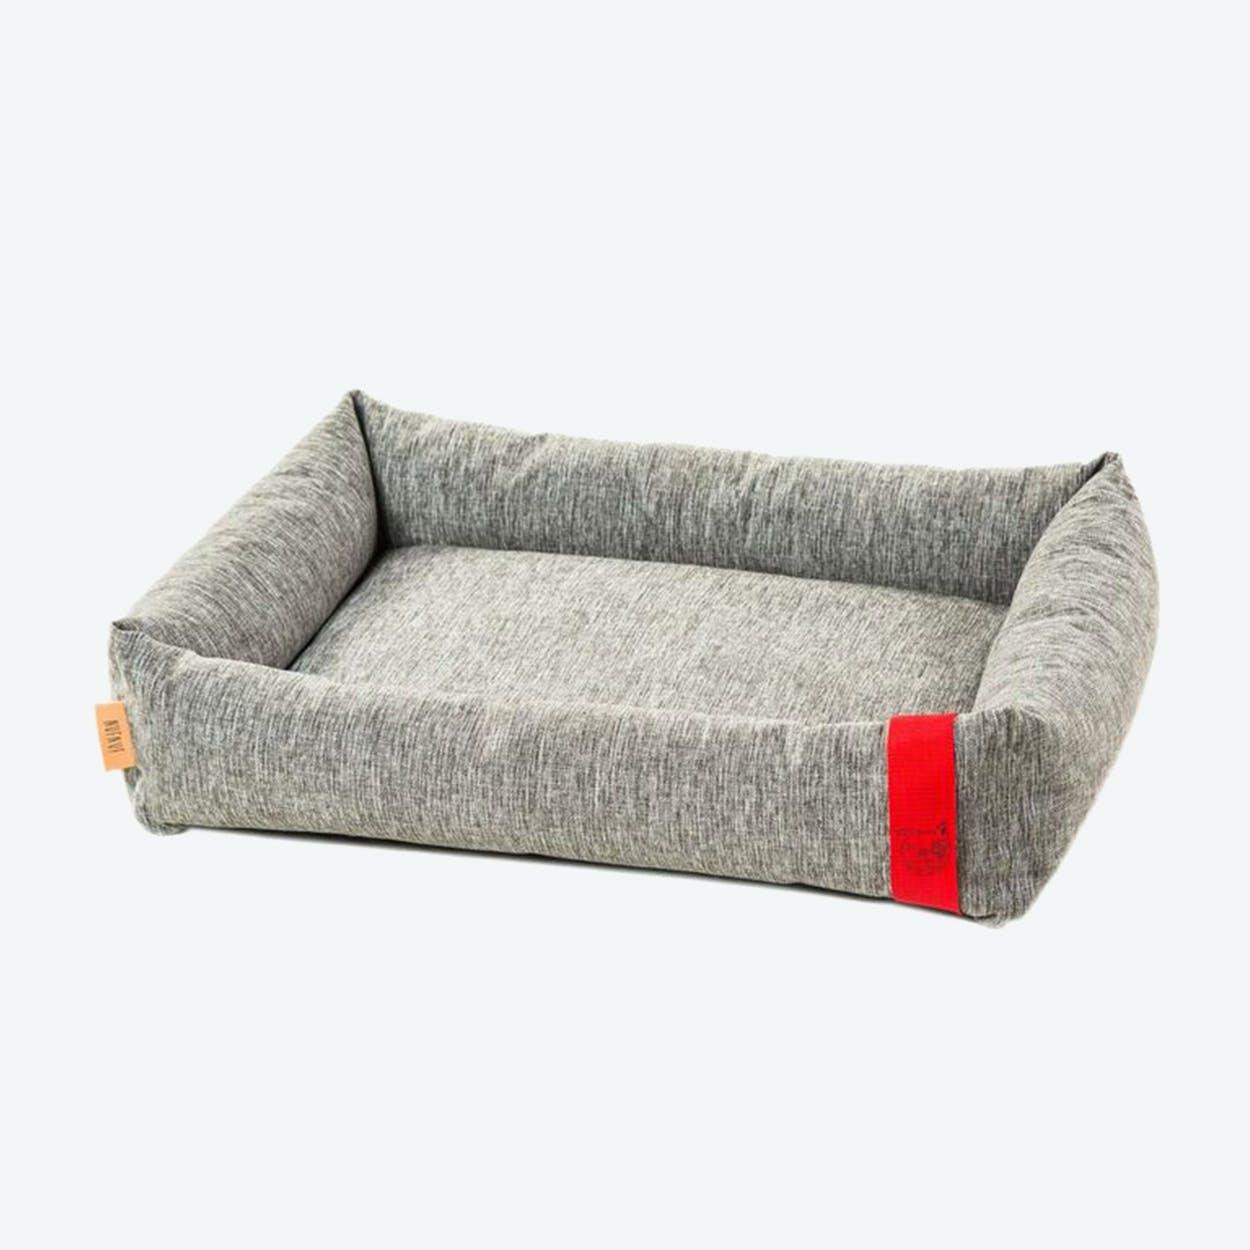 Bobbie Bed in Light Grey